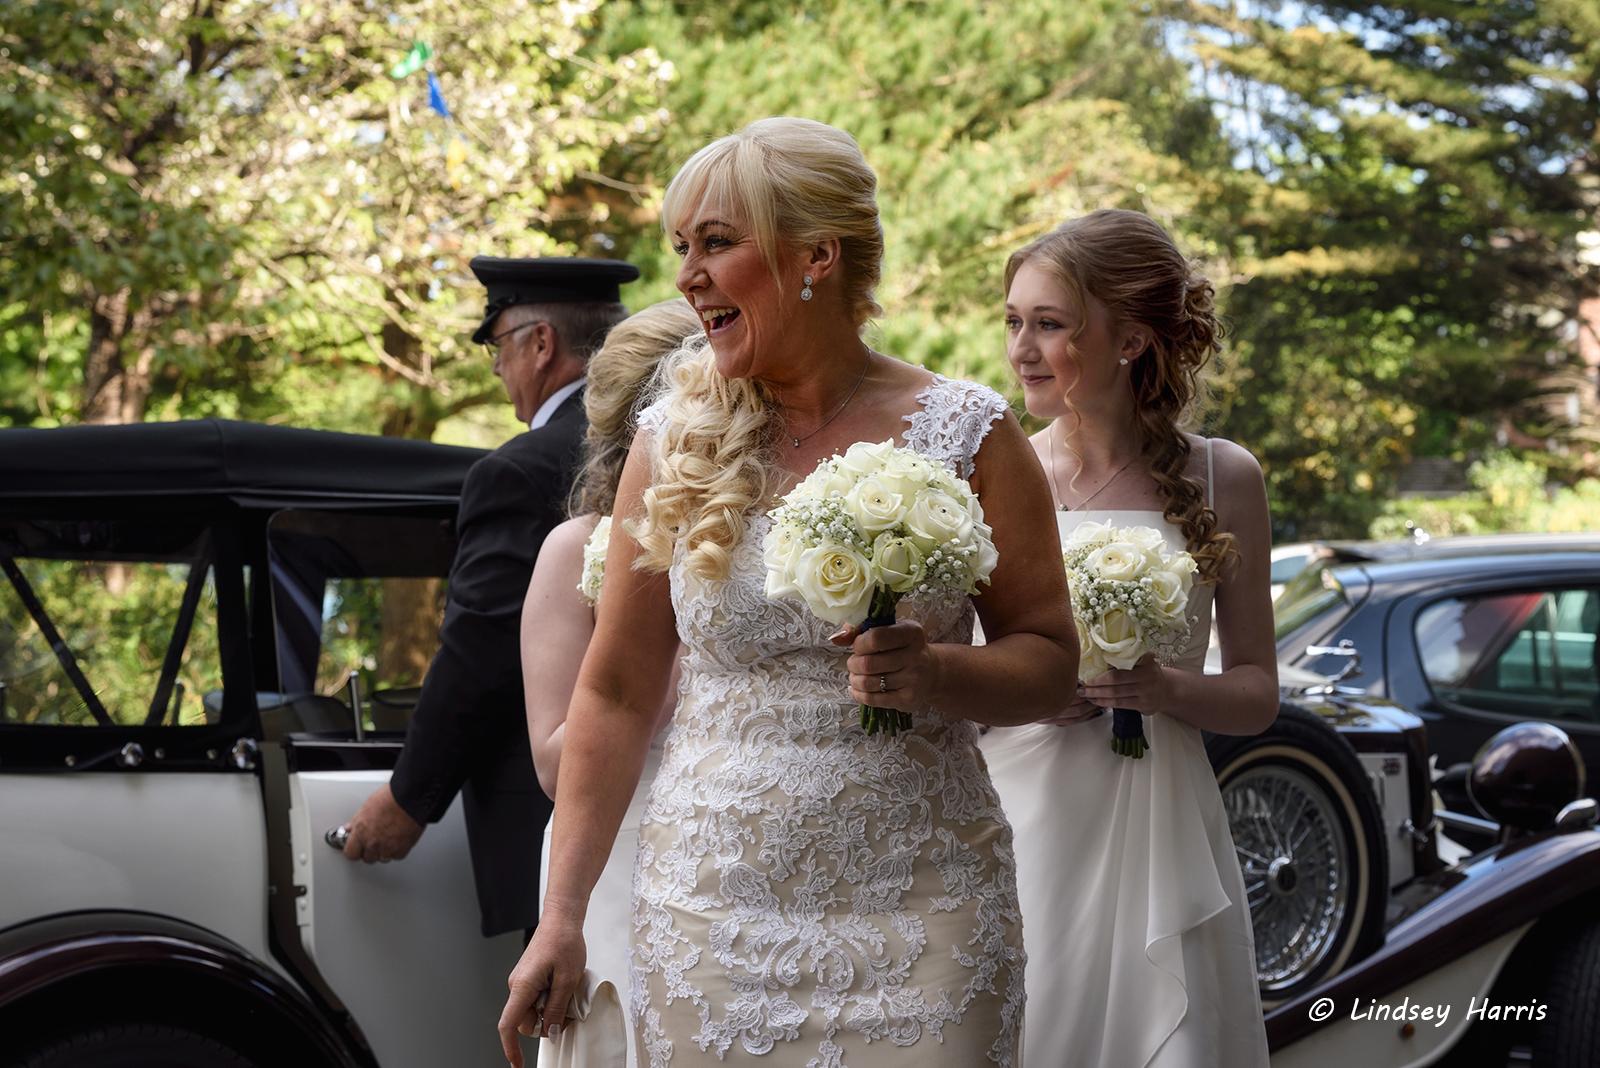 Wedding photographs taken at Westbourne, Dorset.